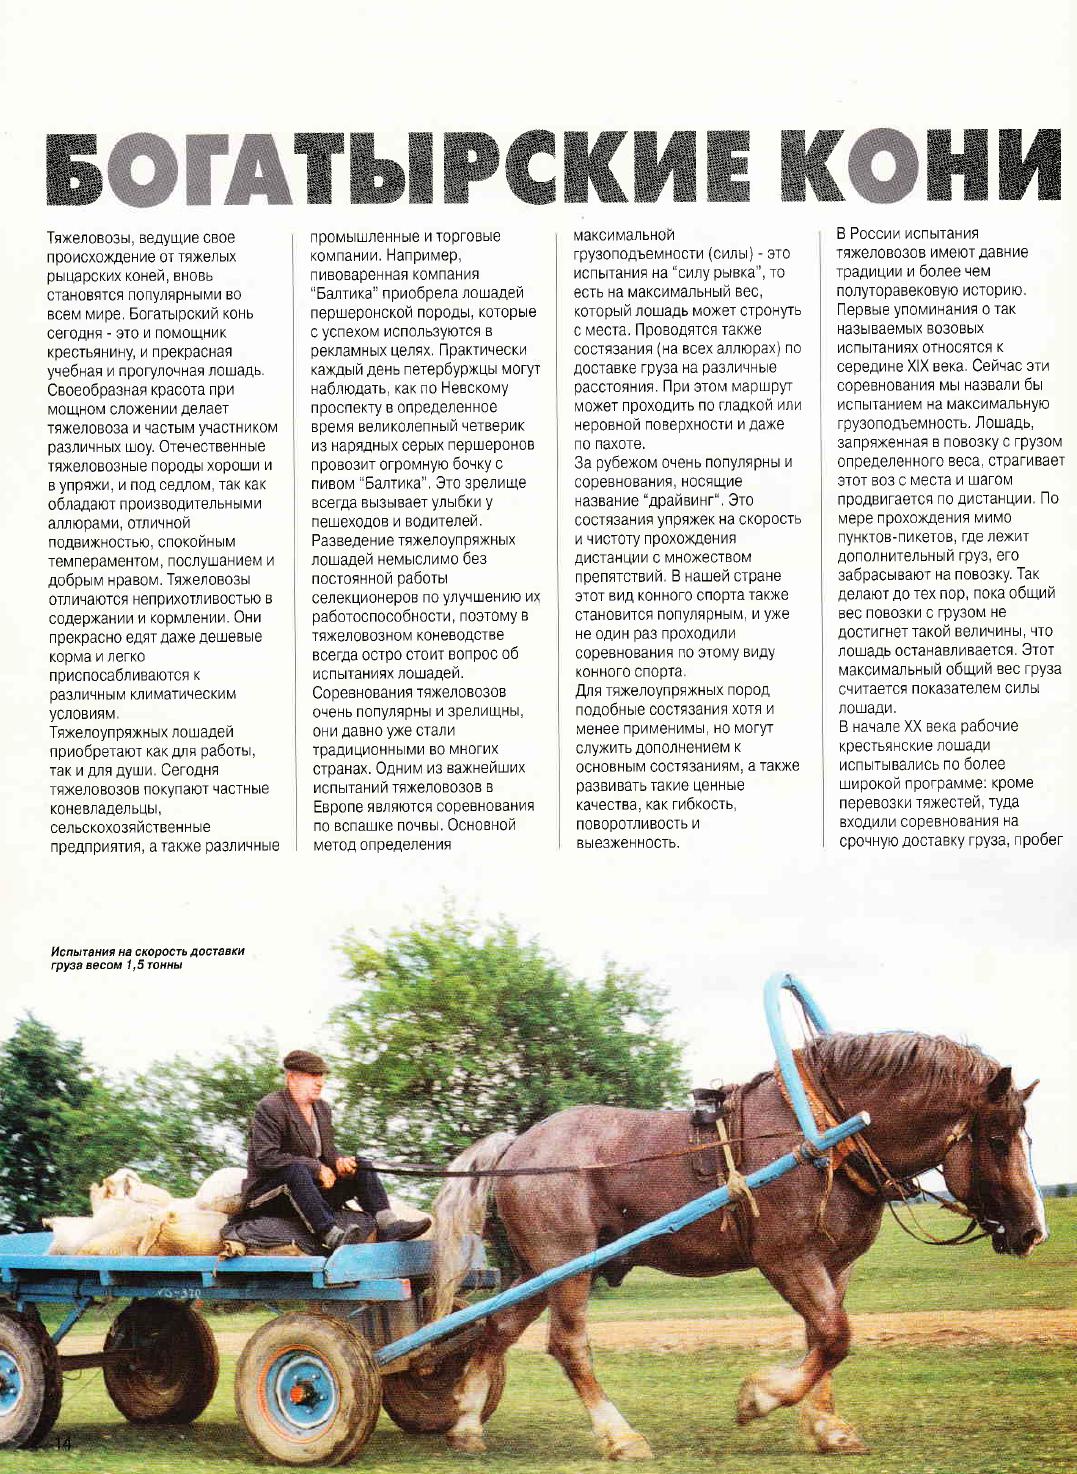 Богатырские кони. Статья из журнала КМ 1-2001 A7308e8bff636499fdb01b3fbfcc3e46